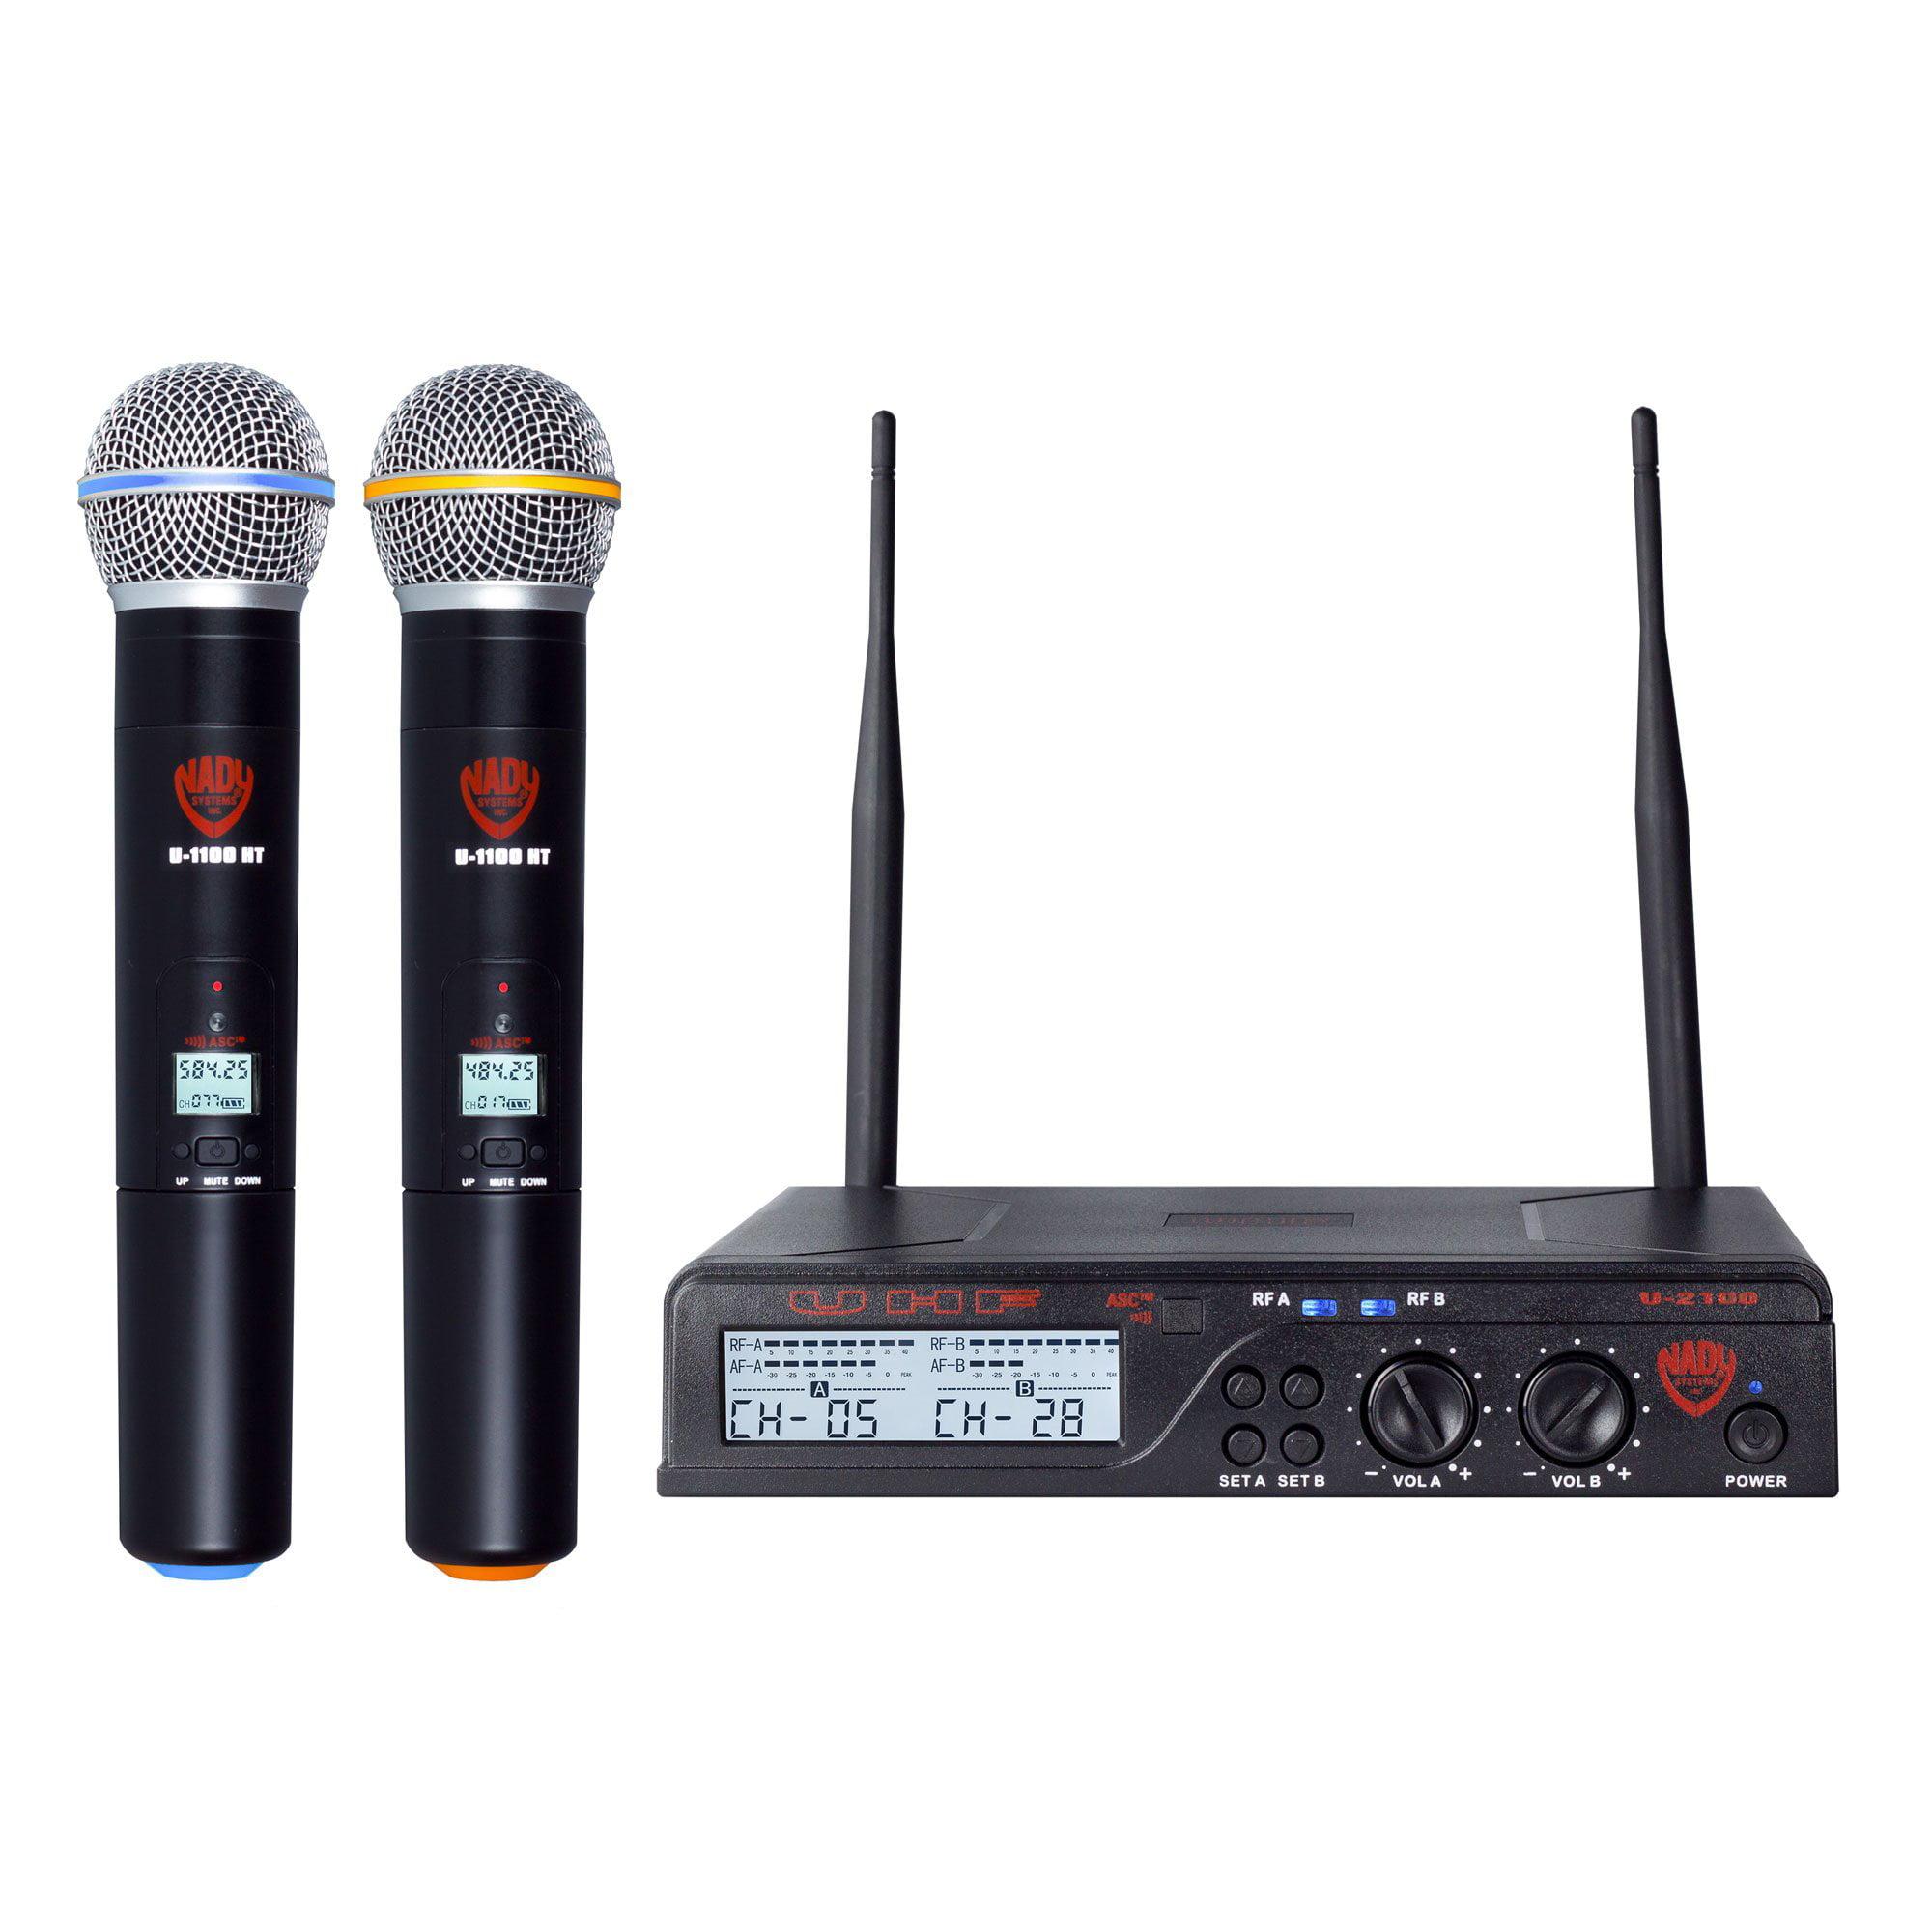 Nady U-2100HTBANDA/B U-2100 Ht Band A/b Dual Uhf Wireless Handheld Microphone System